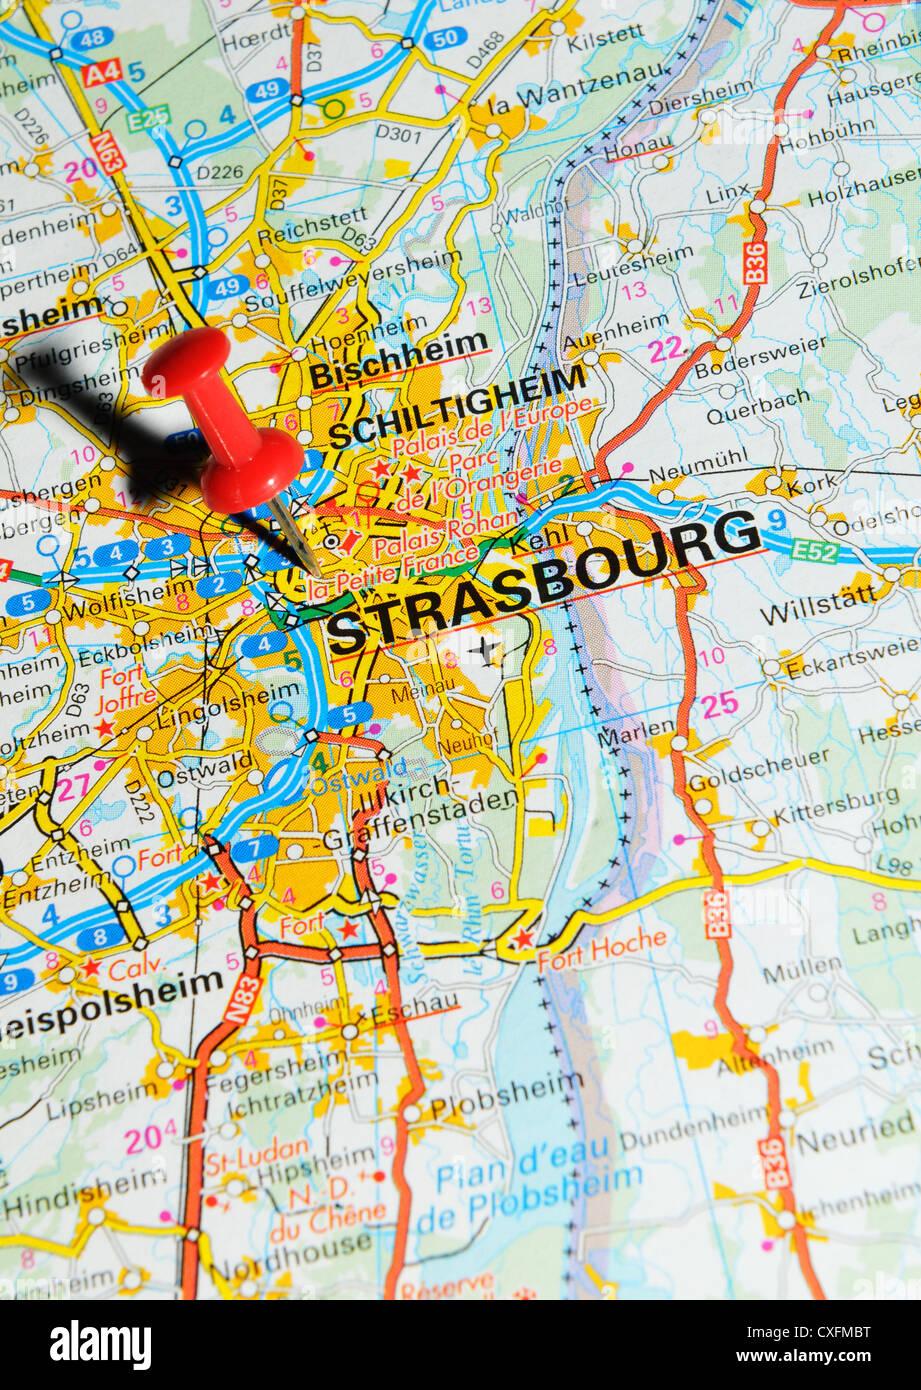 Strasbourg France On Map Stock Photo 50747084 Alamy